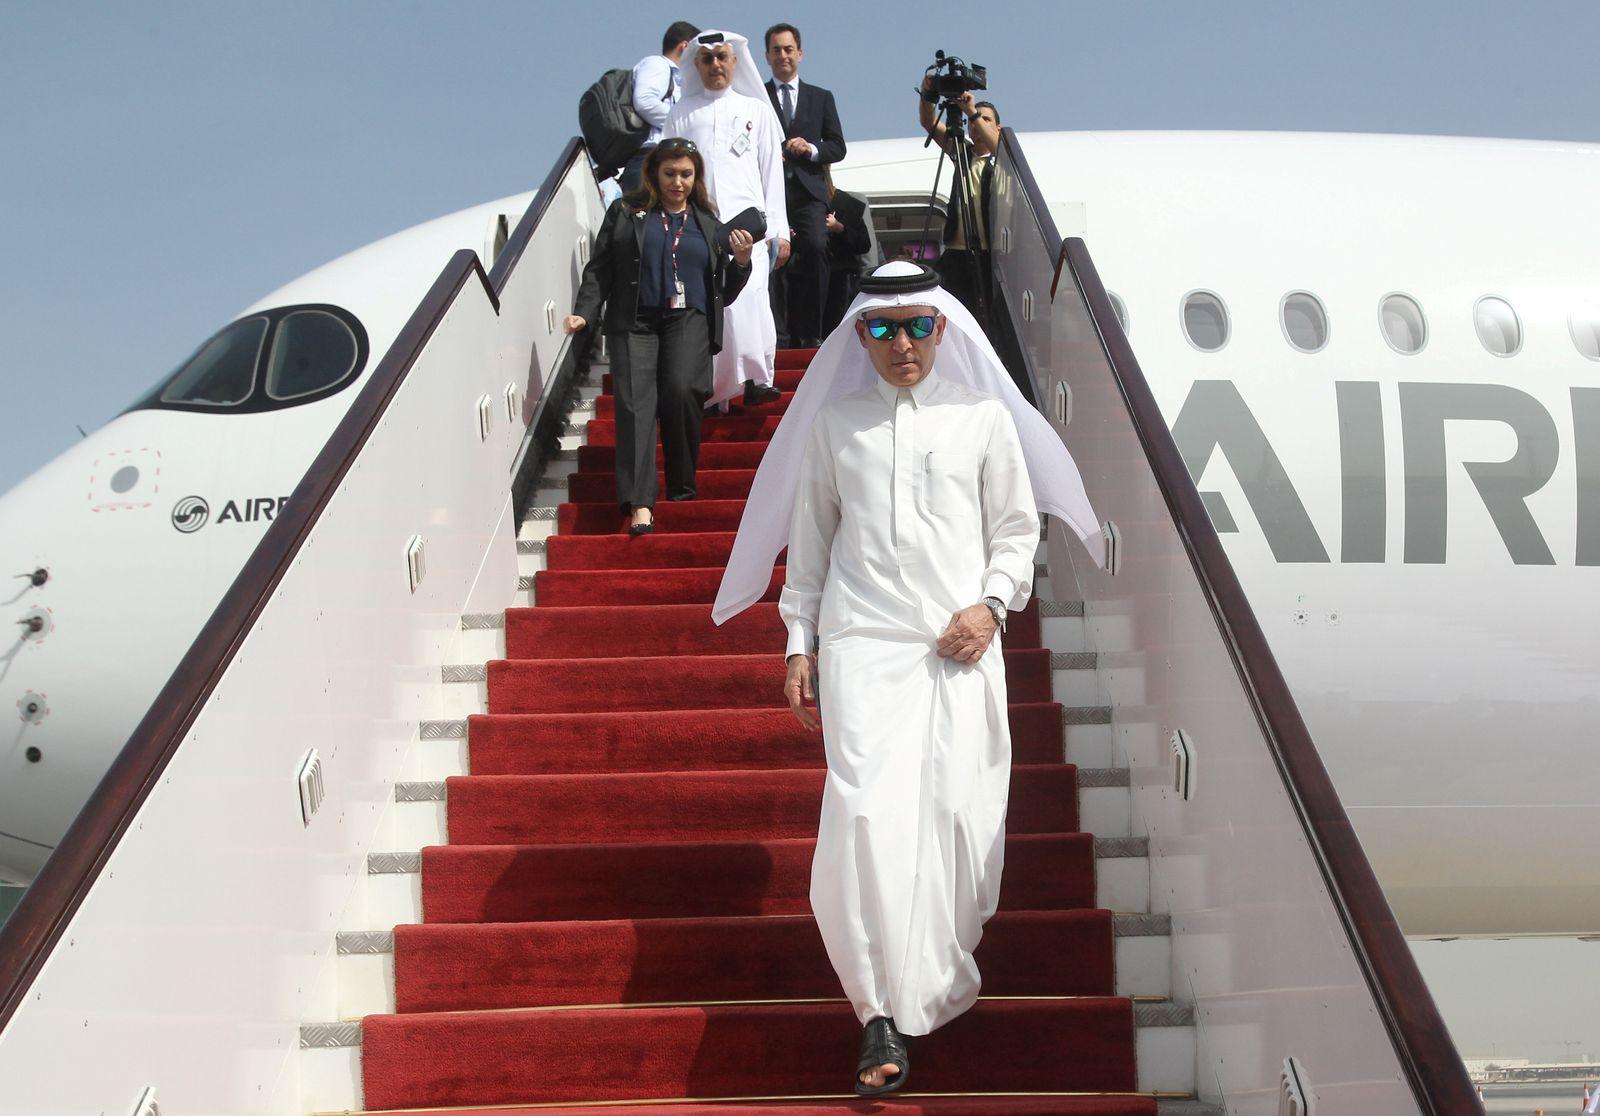 CEO of Qatar Airways Akbar Al Baker gets off an Airbus A350-1000 in Doha